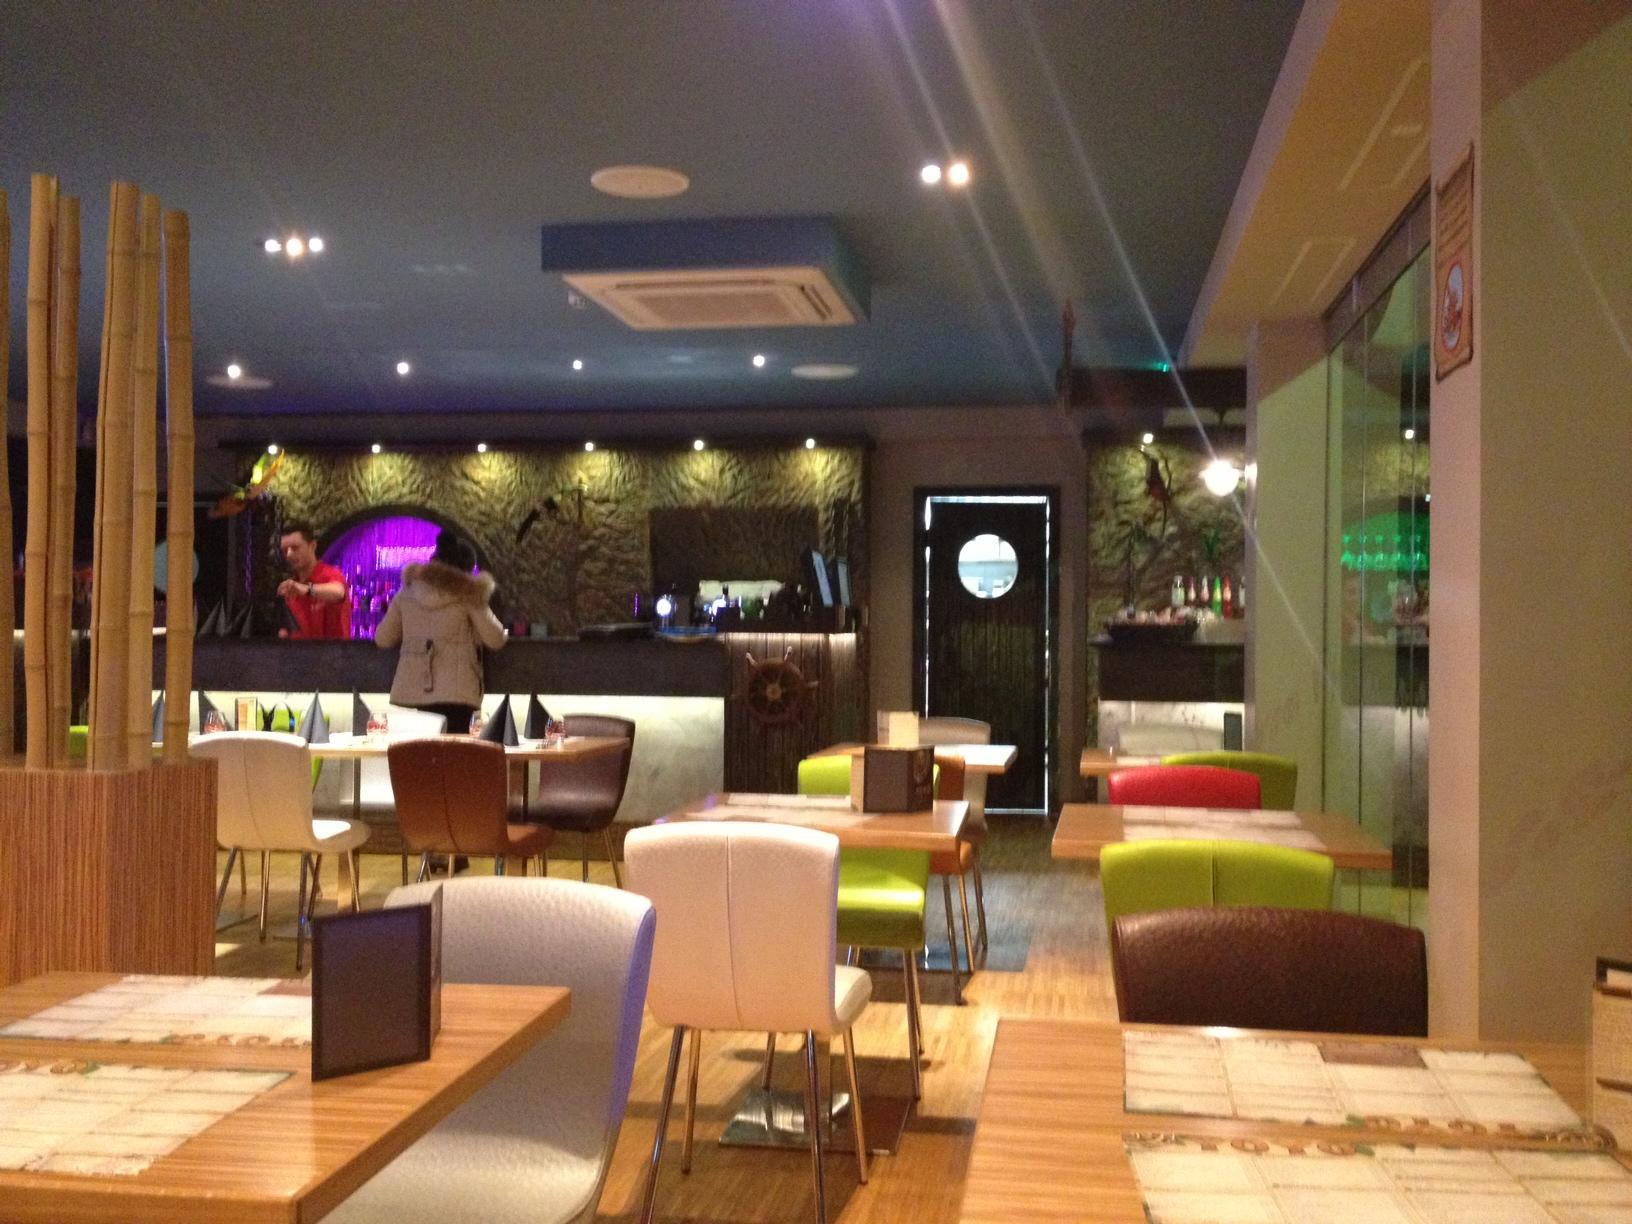 The YOYO Restaurant and Bar.